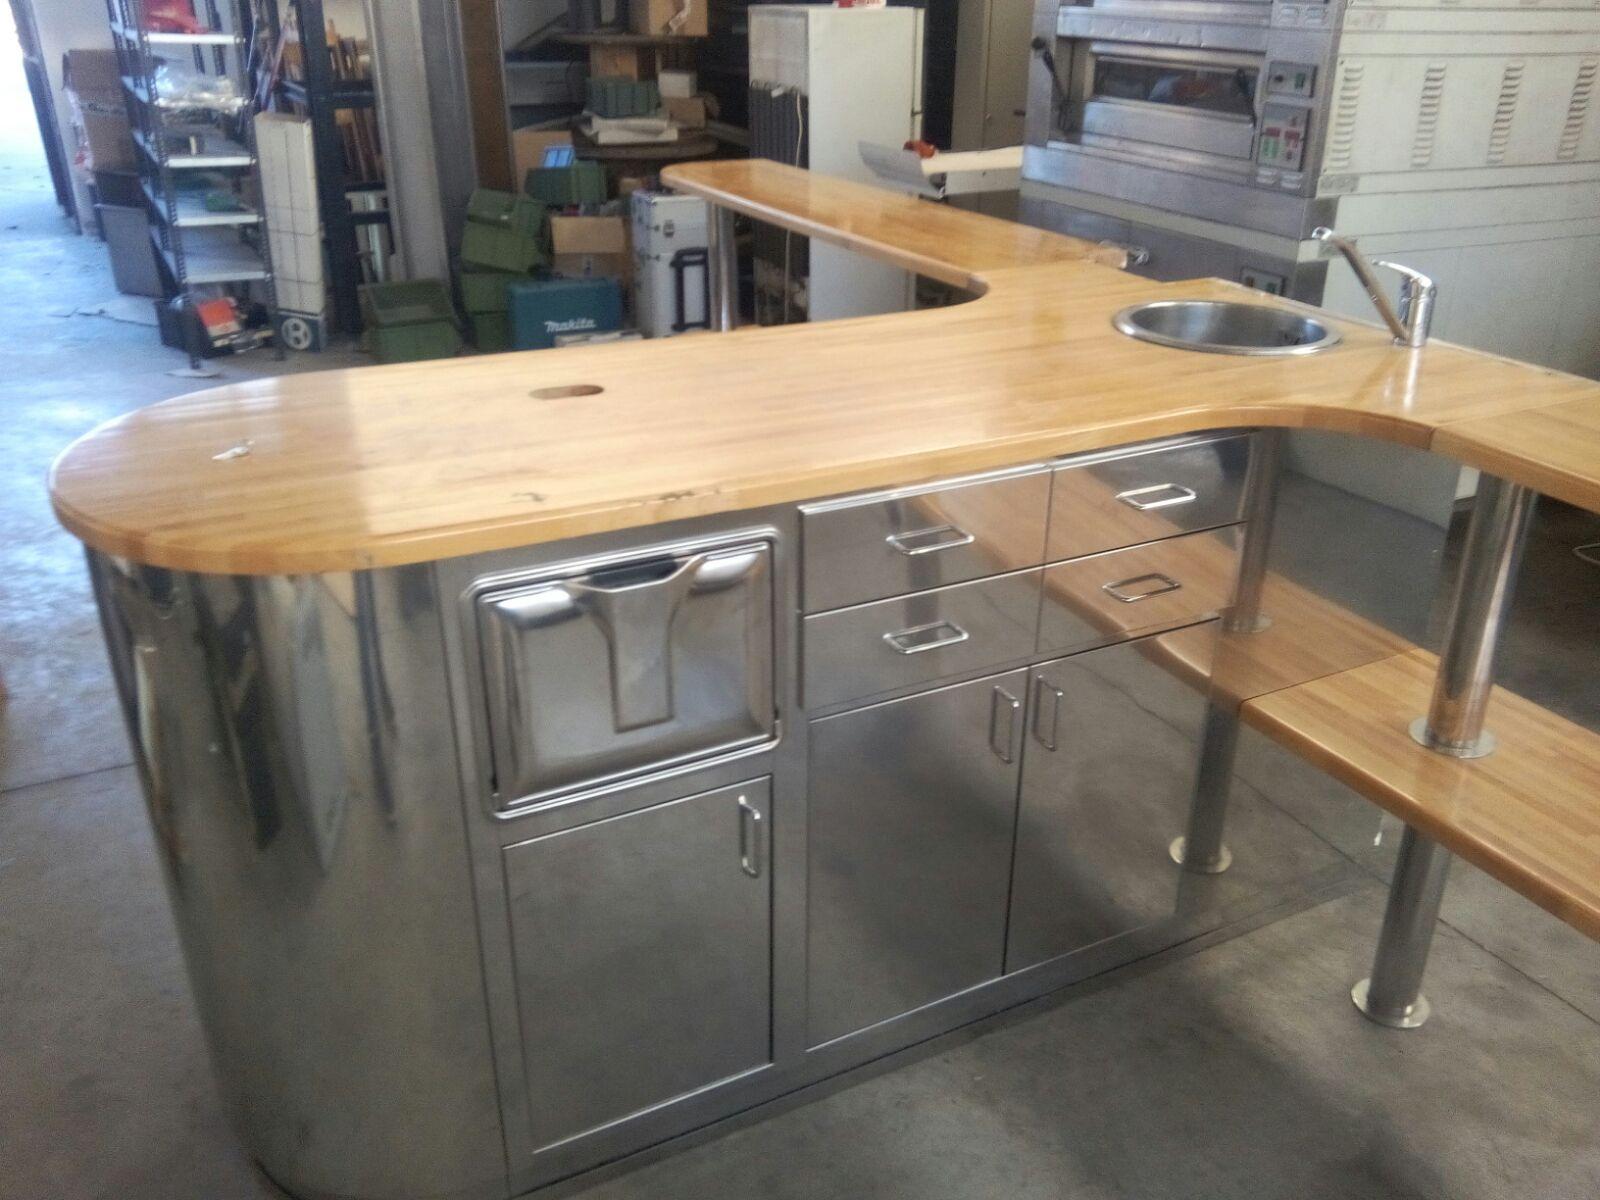 Restock s r l idea banco bar in stile vintage industriale for Bar stile industriale